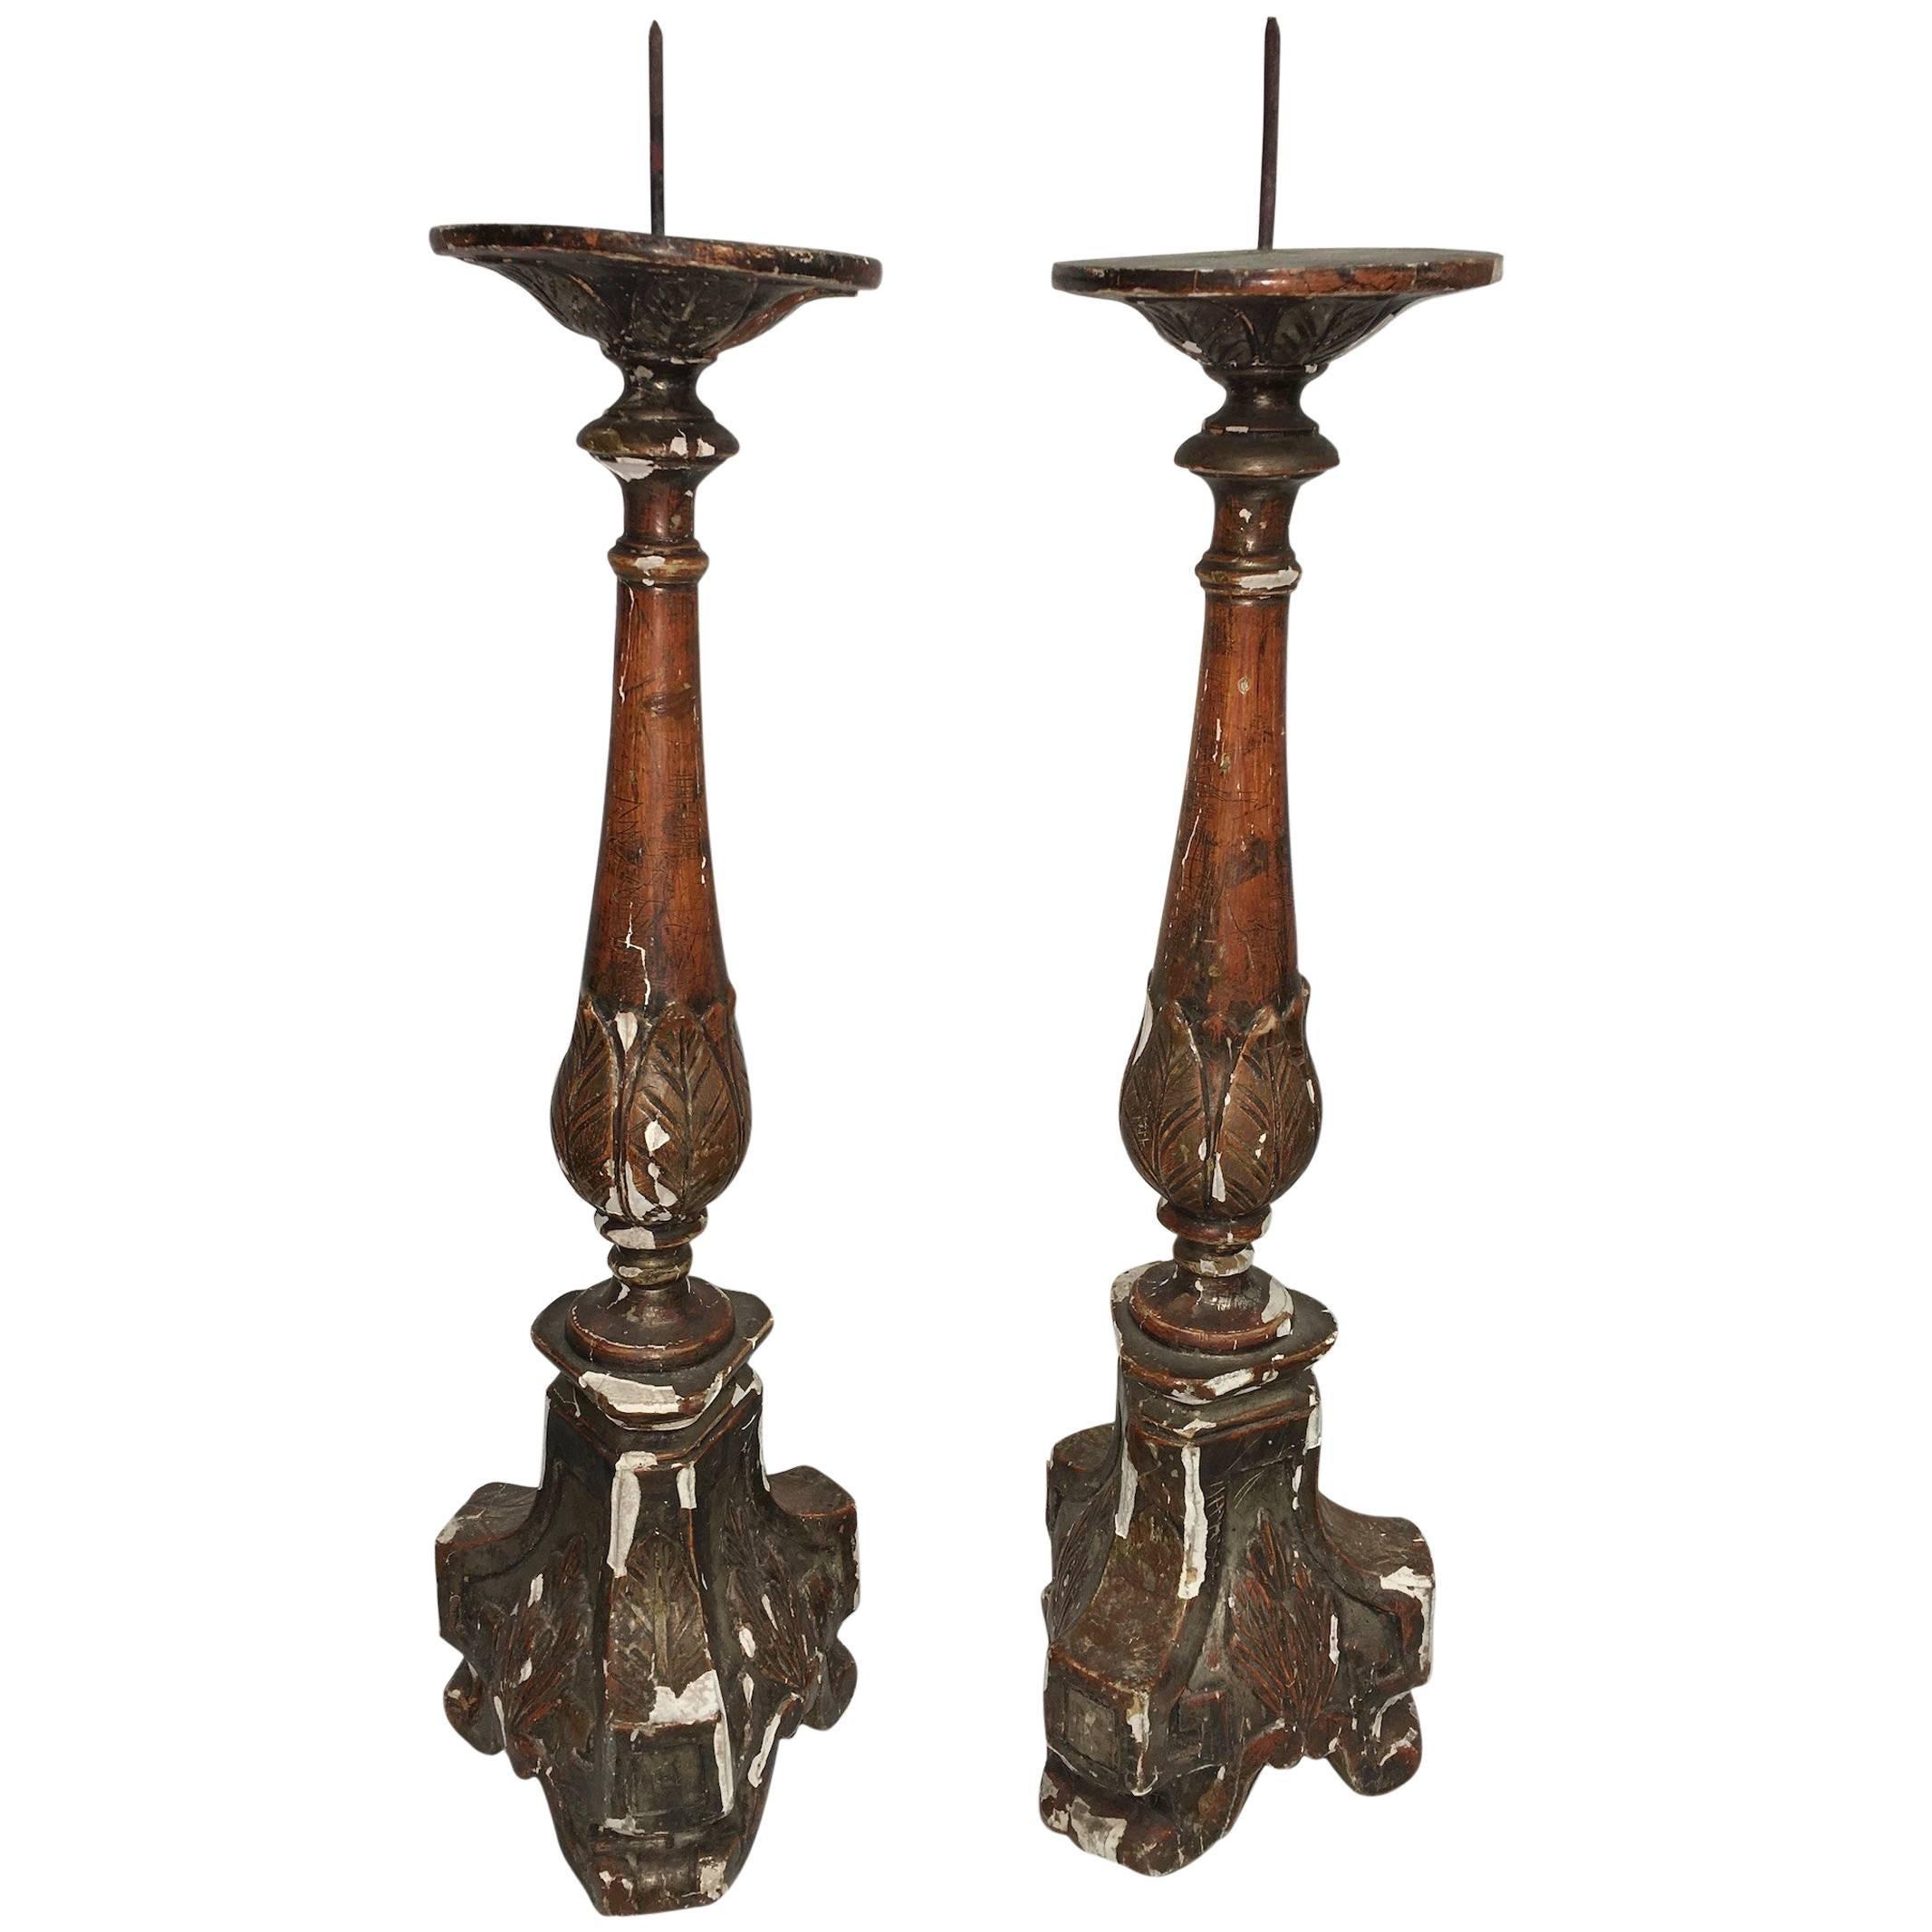 Pair of 18th Century Italian Giltwood Altar Candlesticks